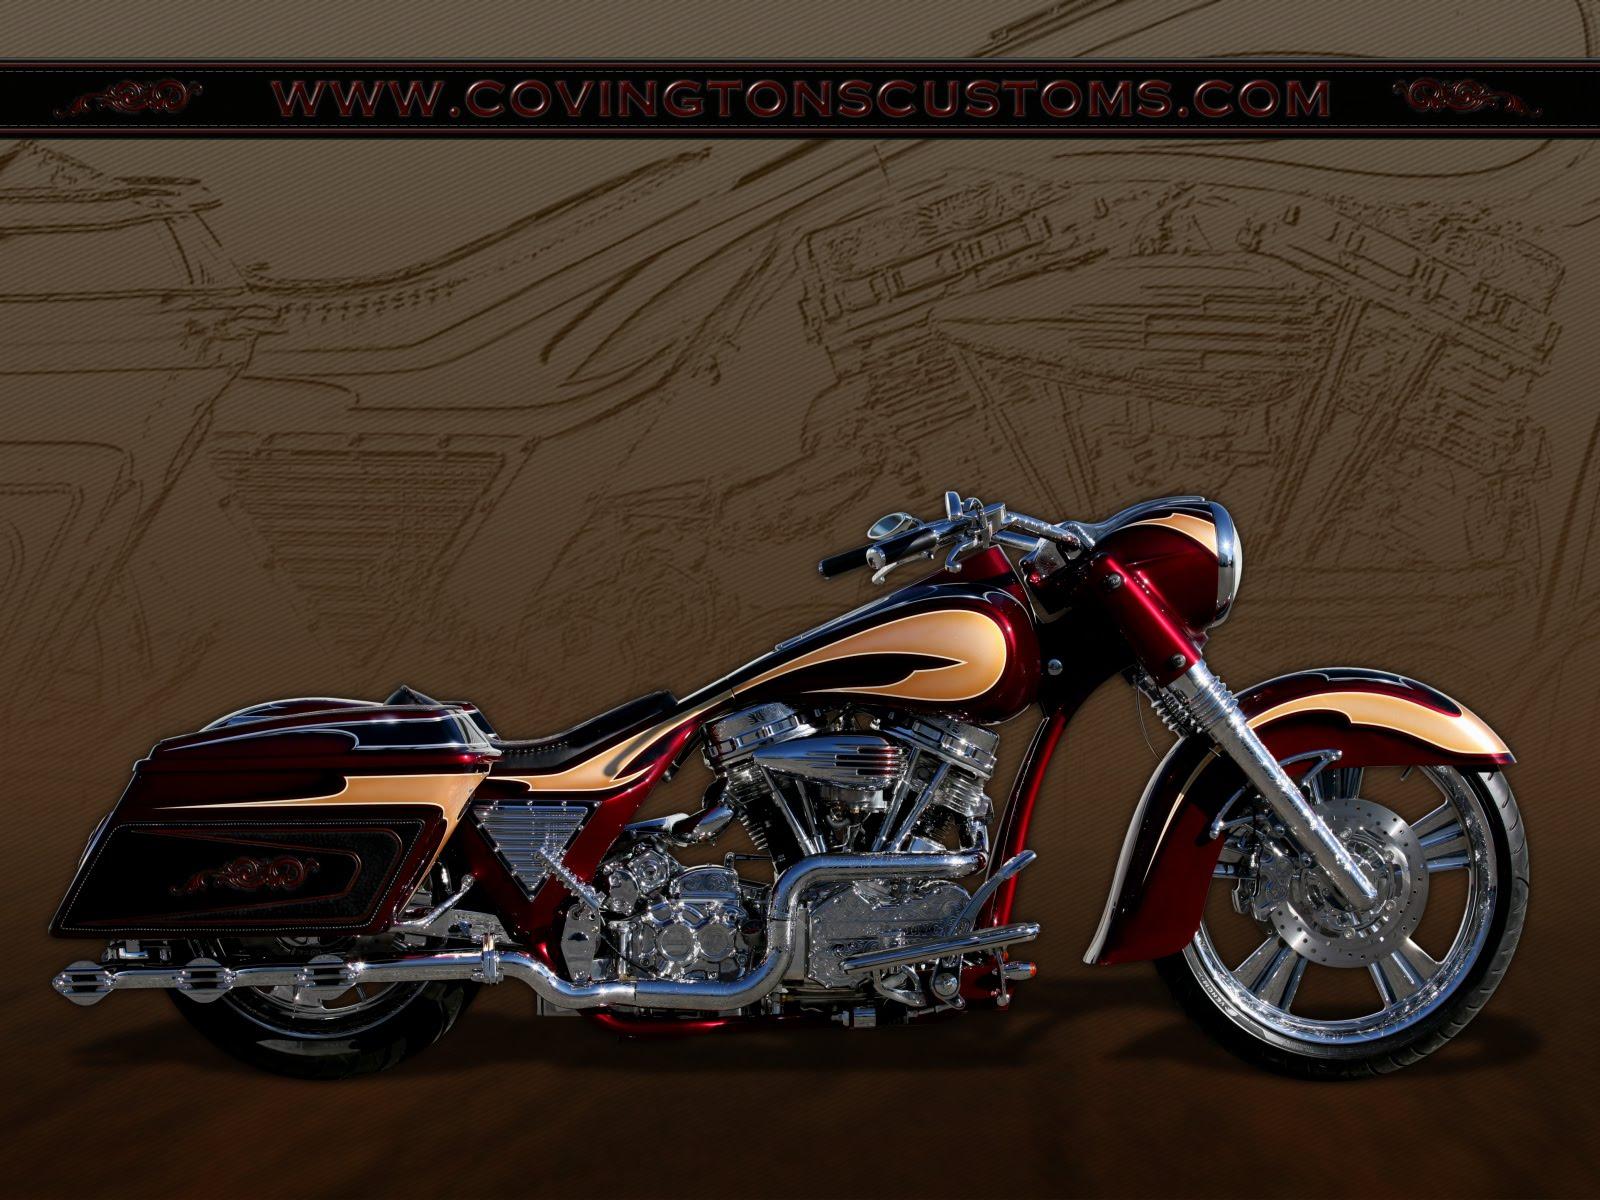 Motorcycle Custom: Biker Blog: COVINGTONS Cycle City